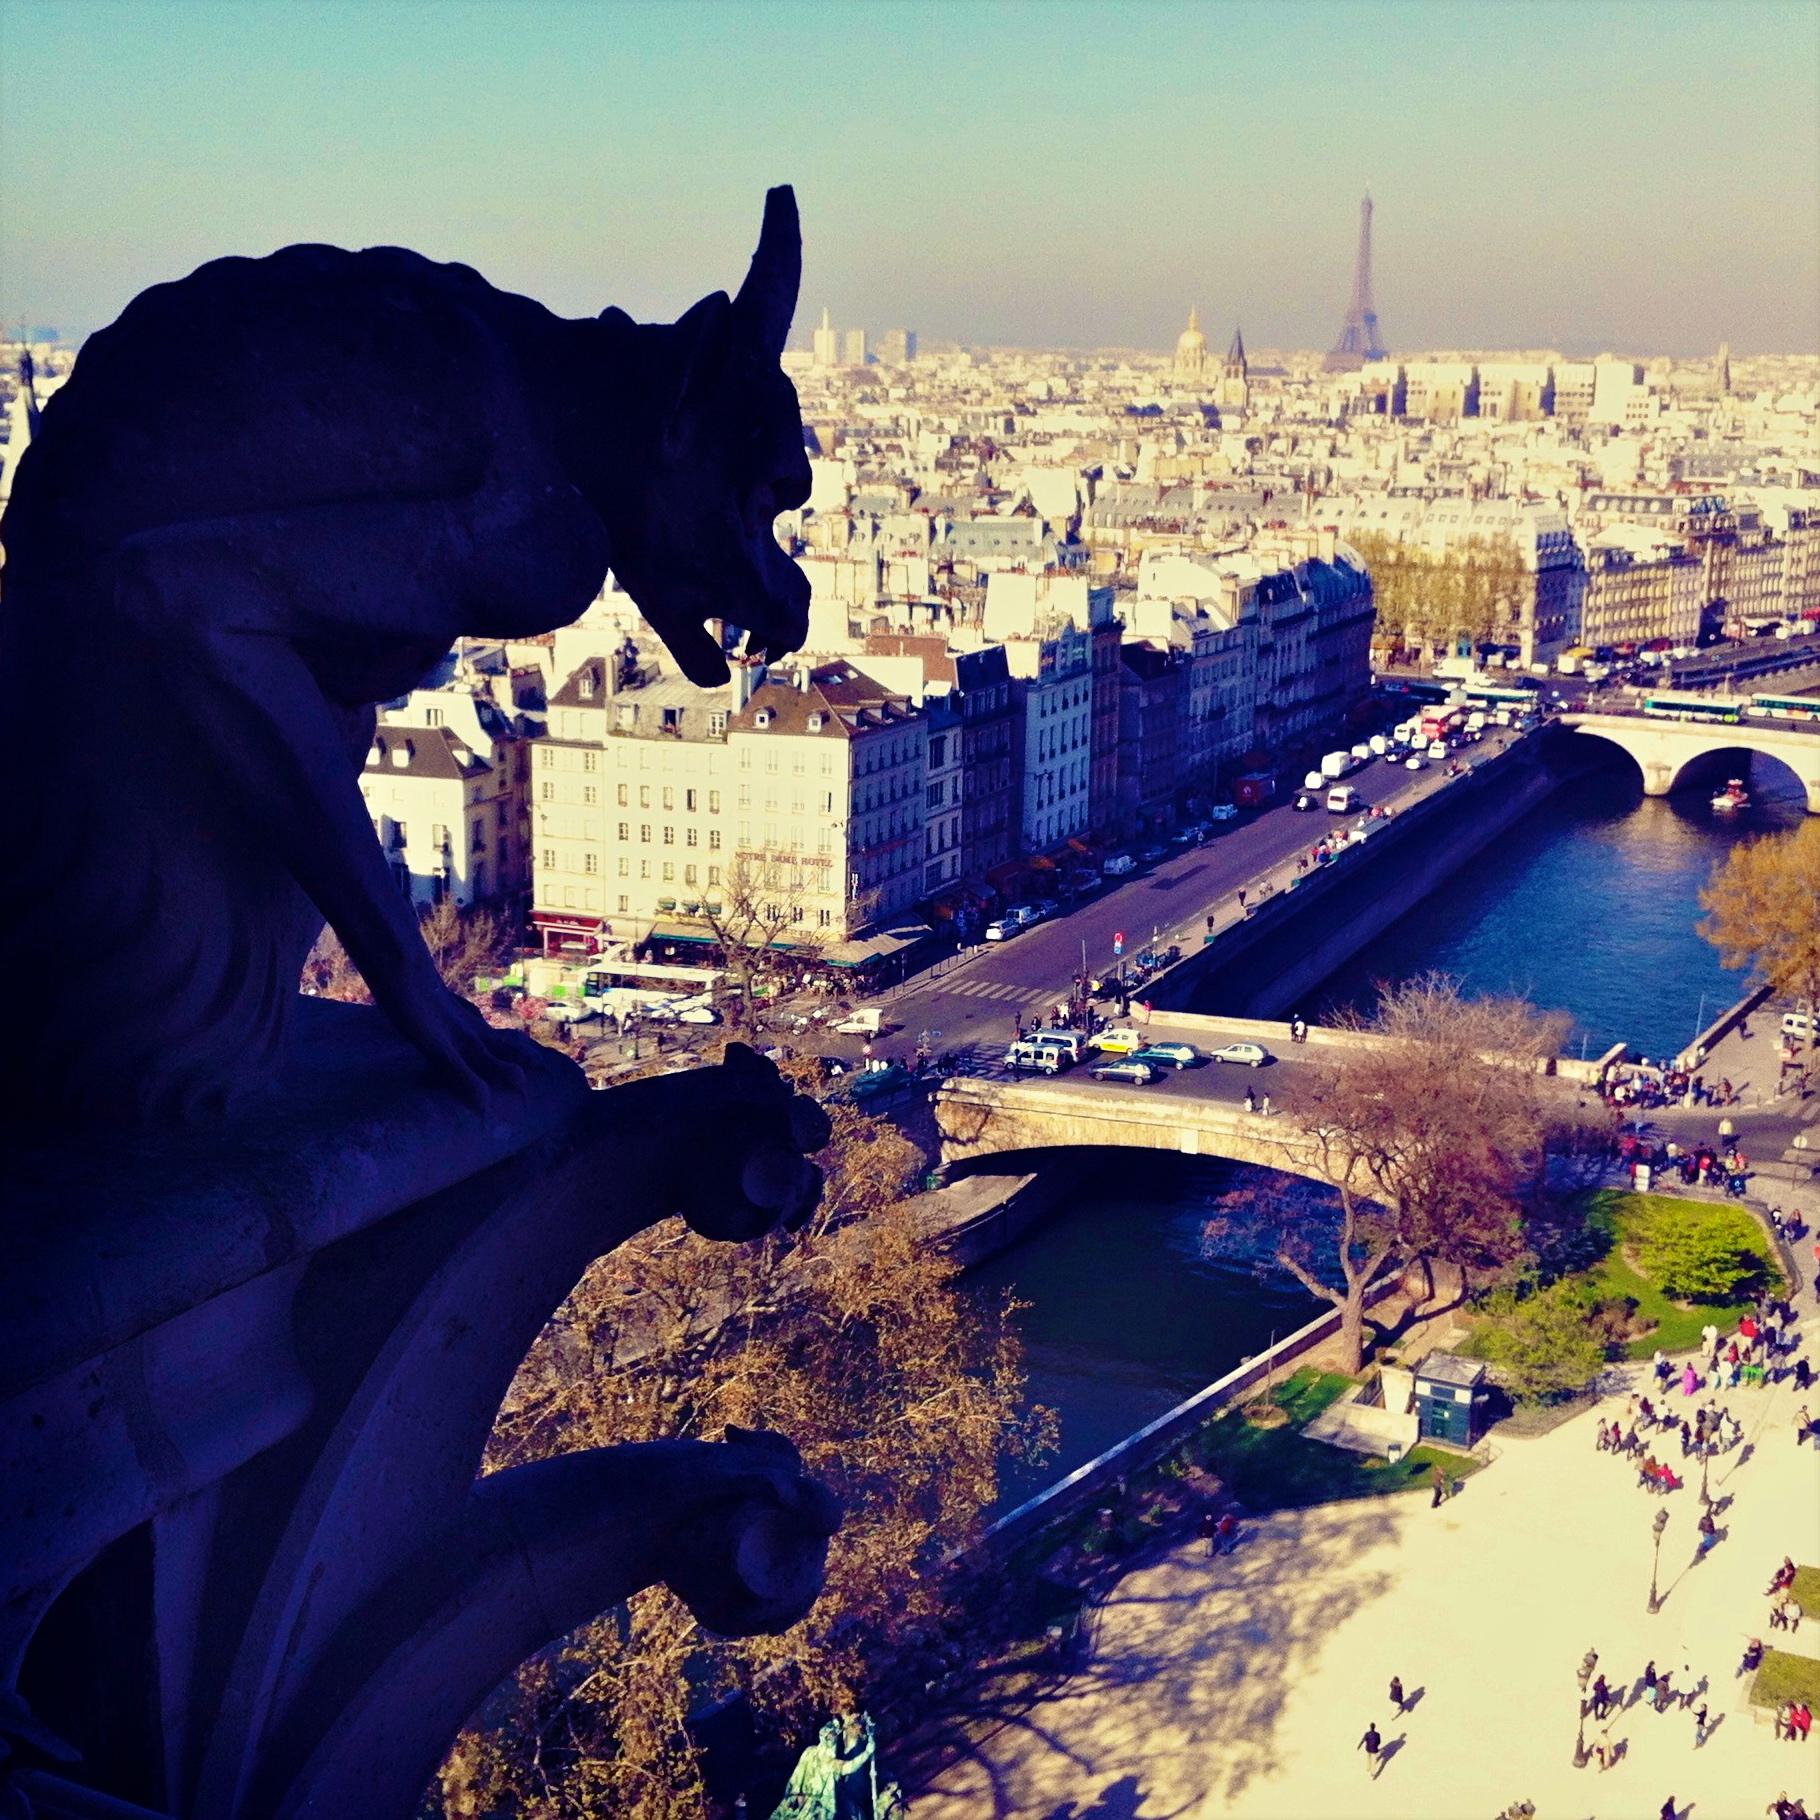 DISCOVER THE SITES OF PARIS